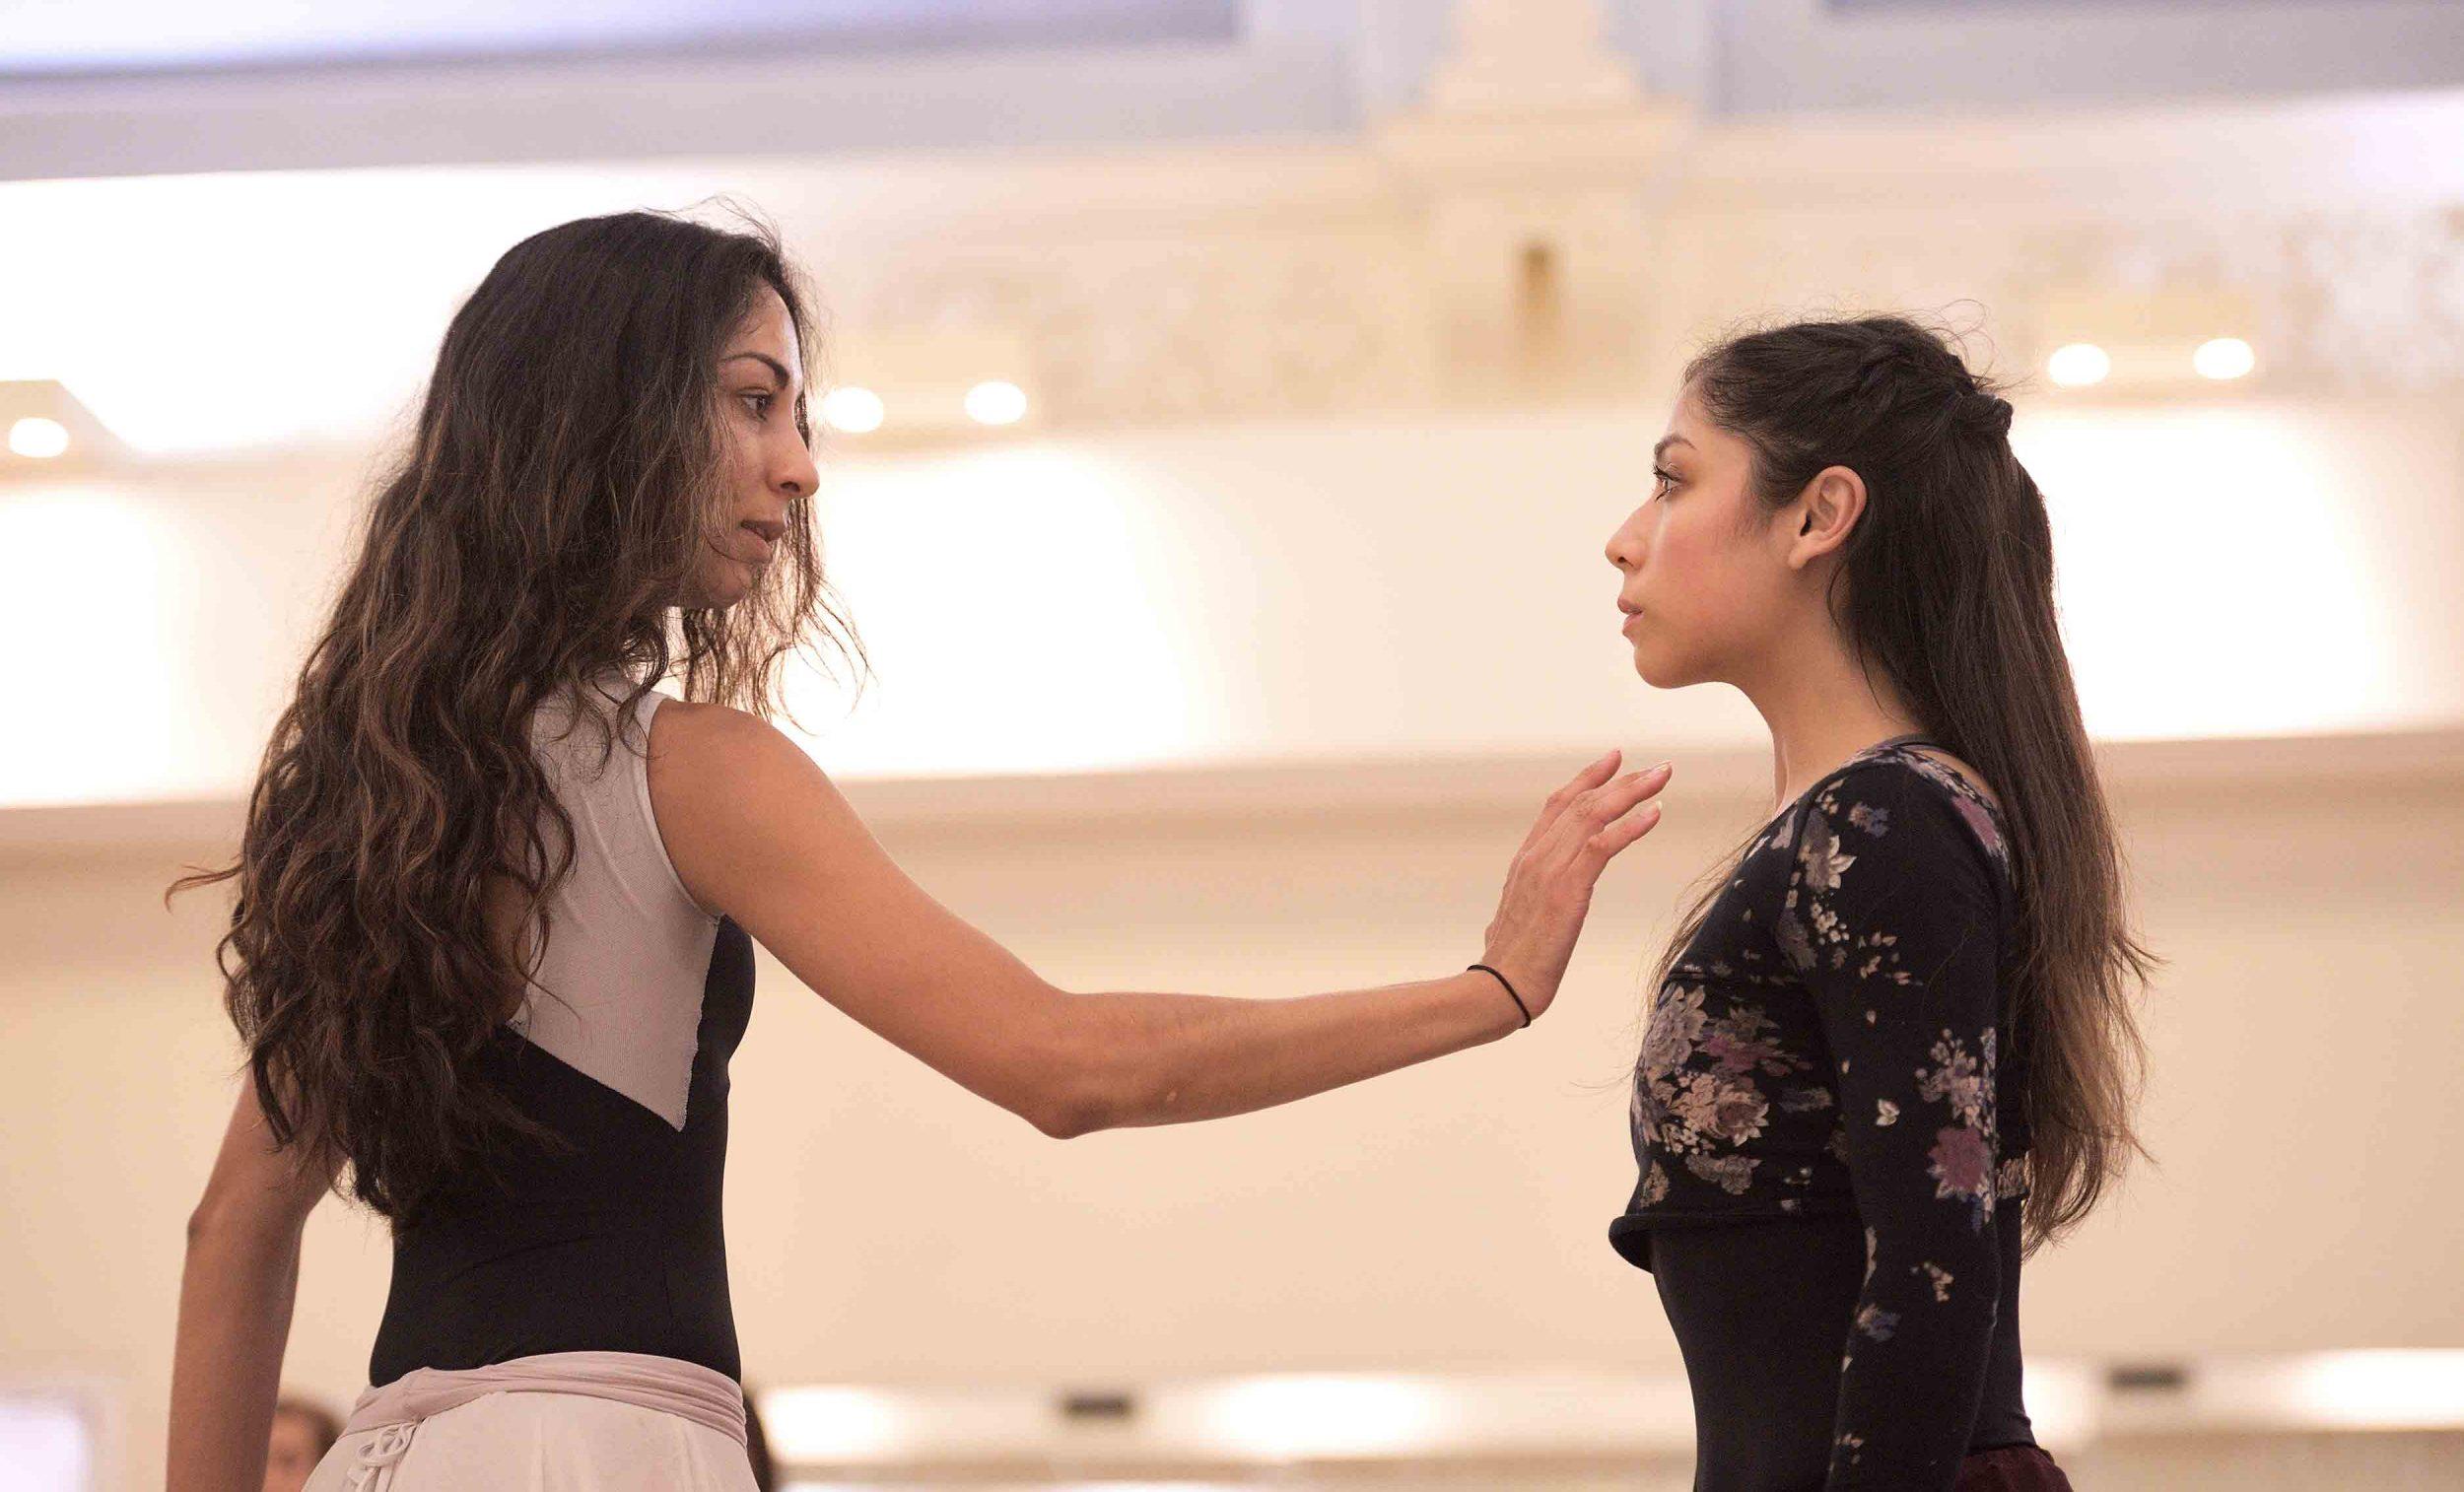 Crystal-Costa-and-Sarah-Kundi-rehearsing-Akram-Khan's-Giselle-©-Laurent-Liotardo--(1)